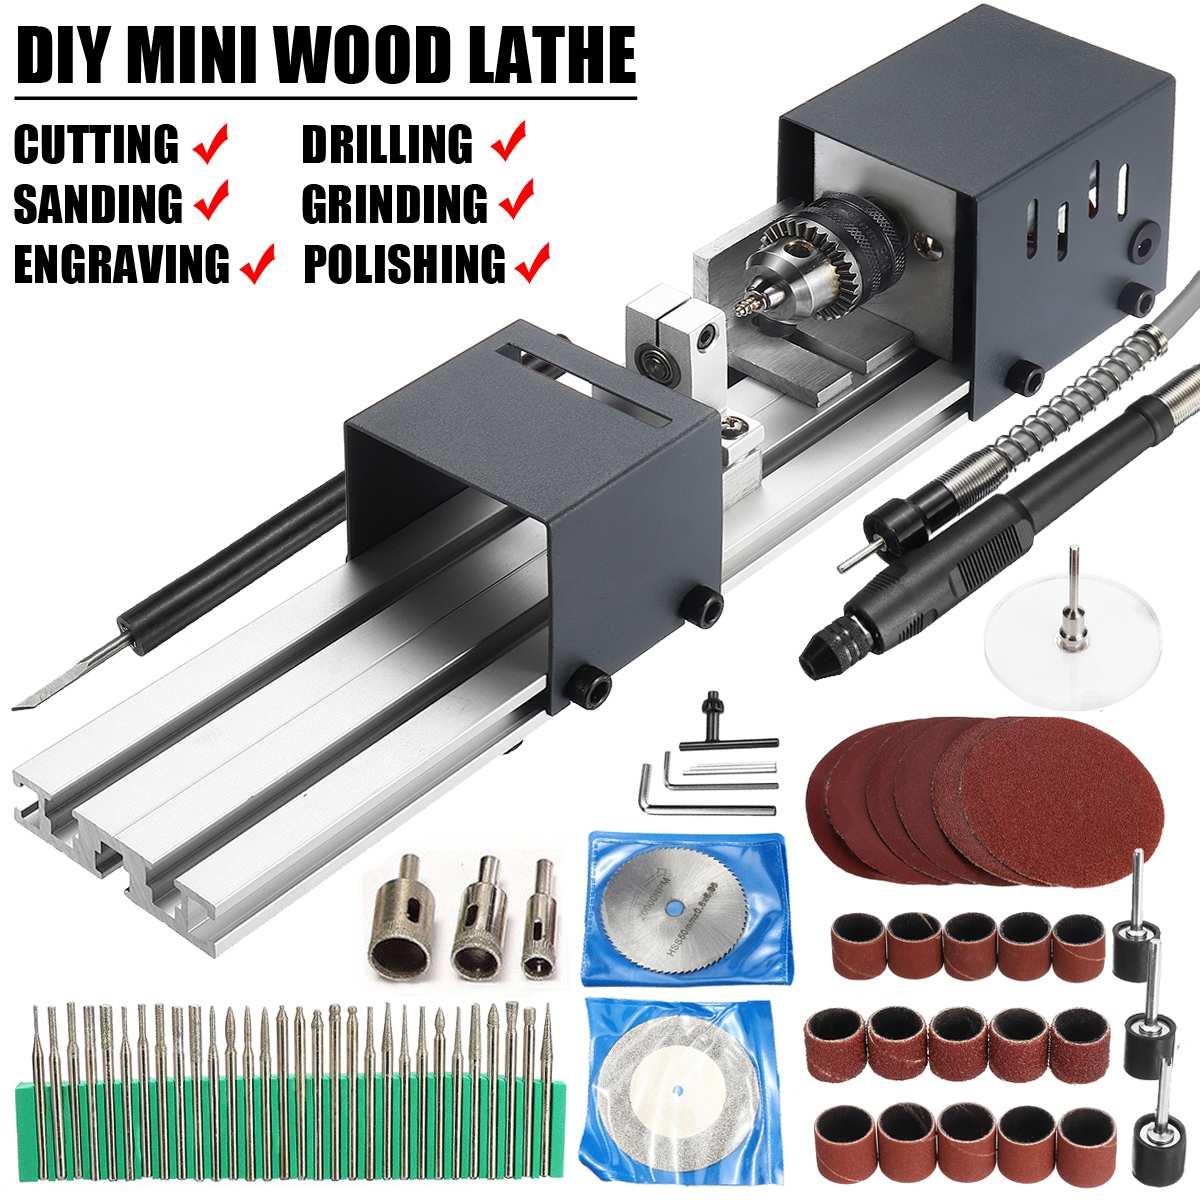 24V 80W Mini Lathe Beads Machine Polisher Table Saw Mini DIY Woodworking Lathe Rotary Tool Kit Accessory